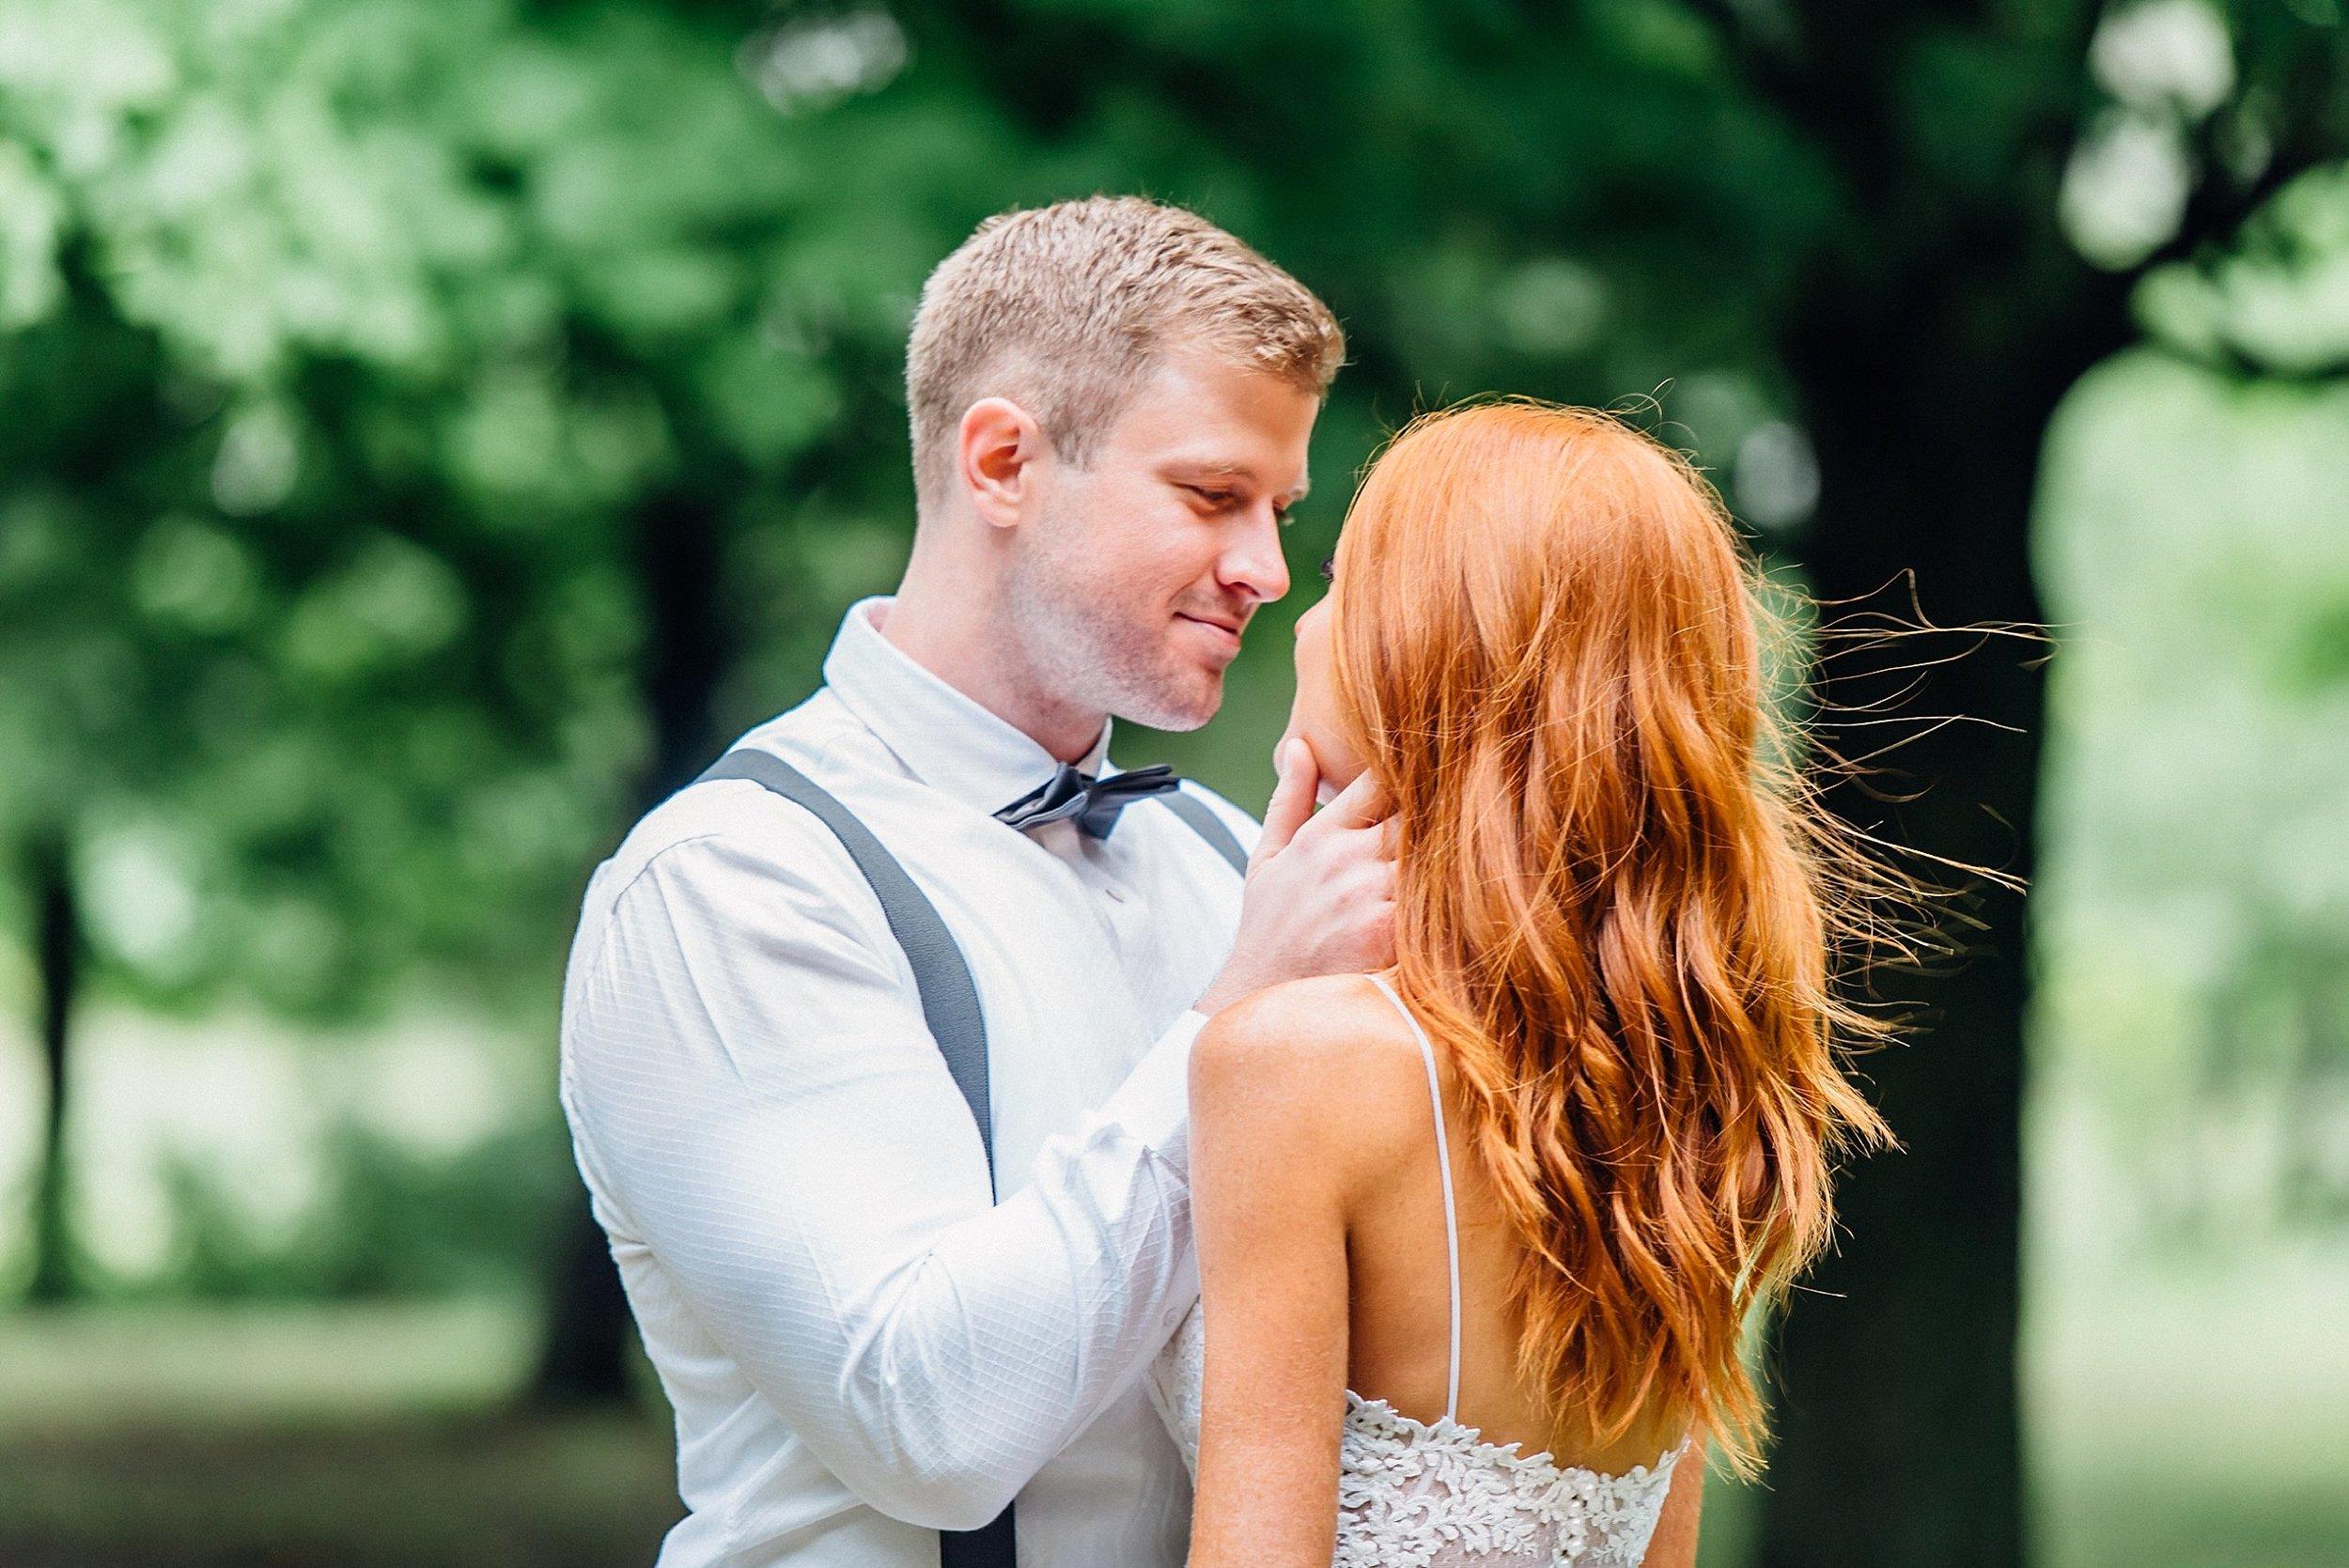 Ottawa Wedding Photographer - Stanley's Olde Maple Lane Barn Wedding - Ali & Batoul Photography_0015.jpg